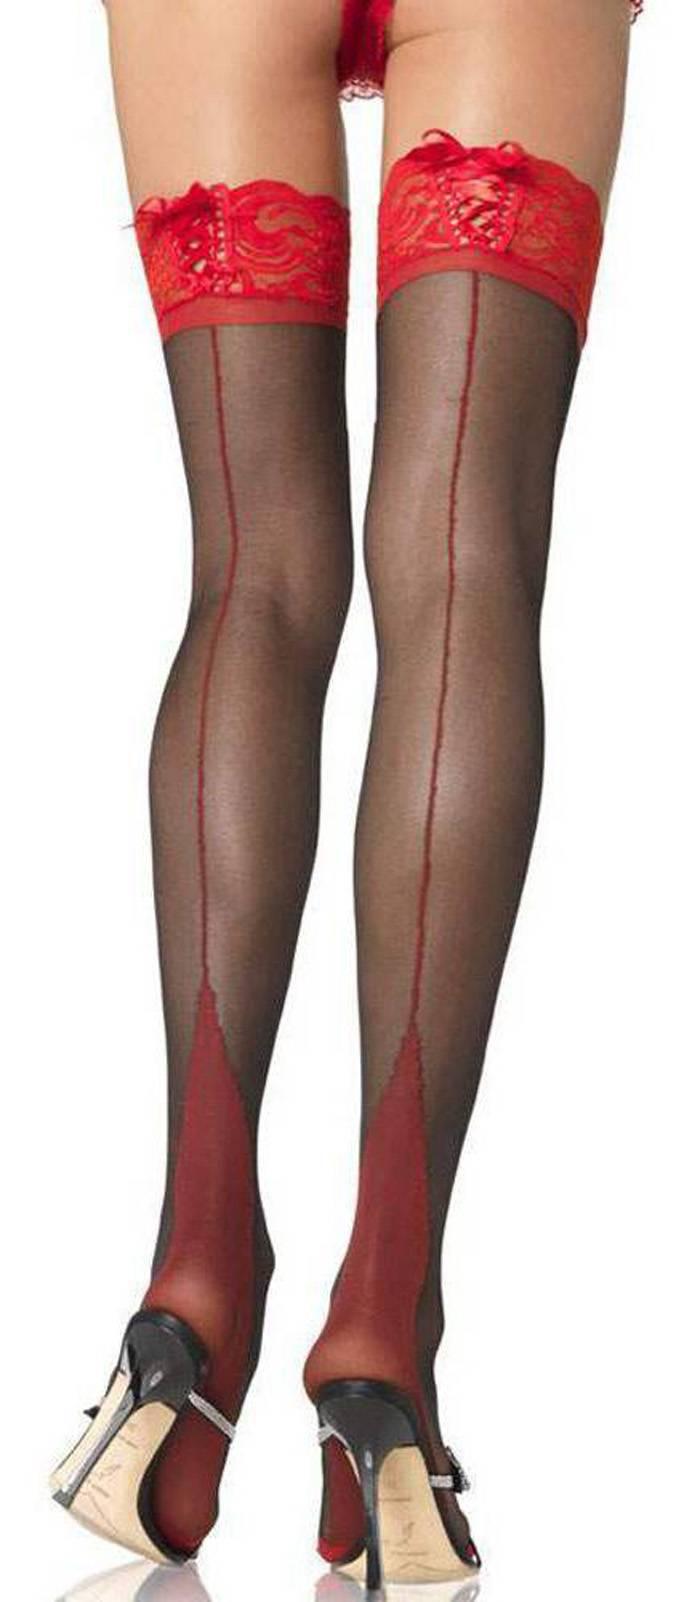 89f2b82f825ce0 Details zu Halterlose Naht Strümpfe mit Cuban Heel Ferse